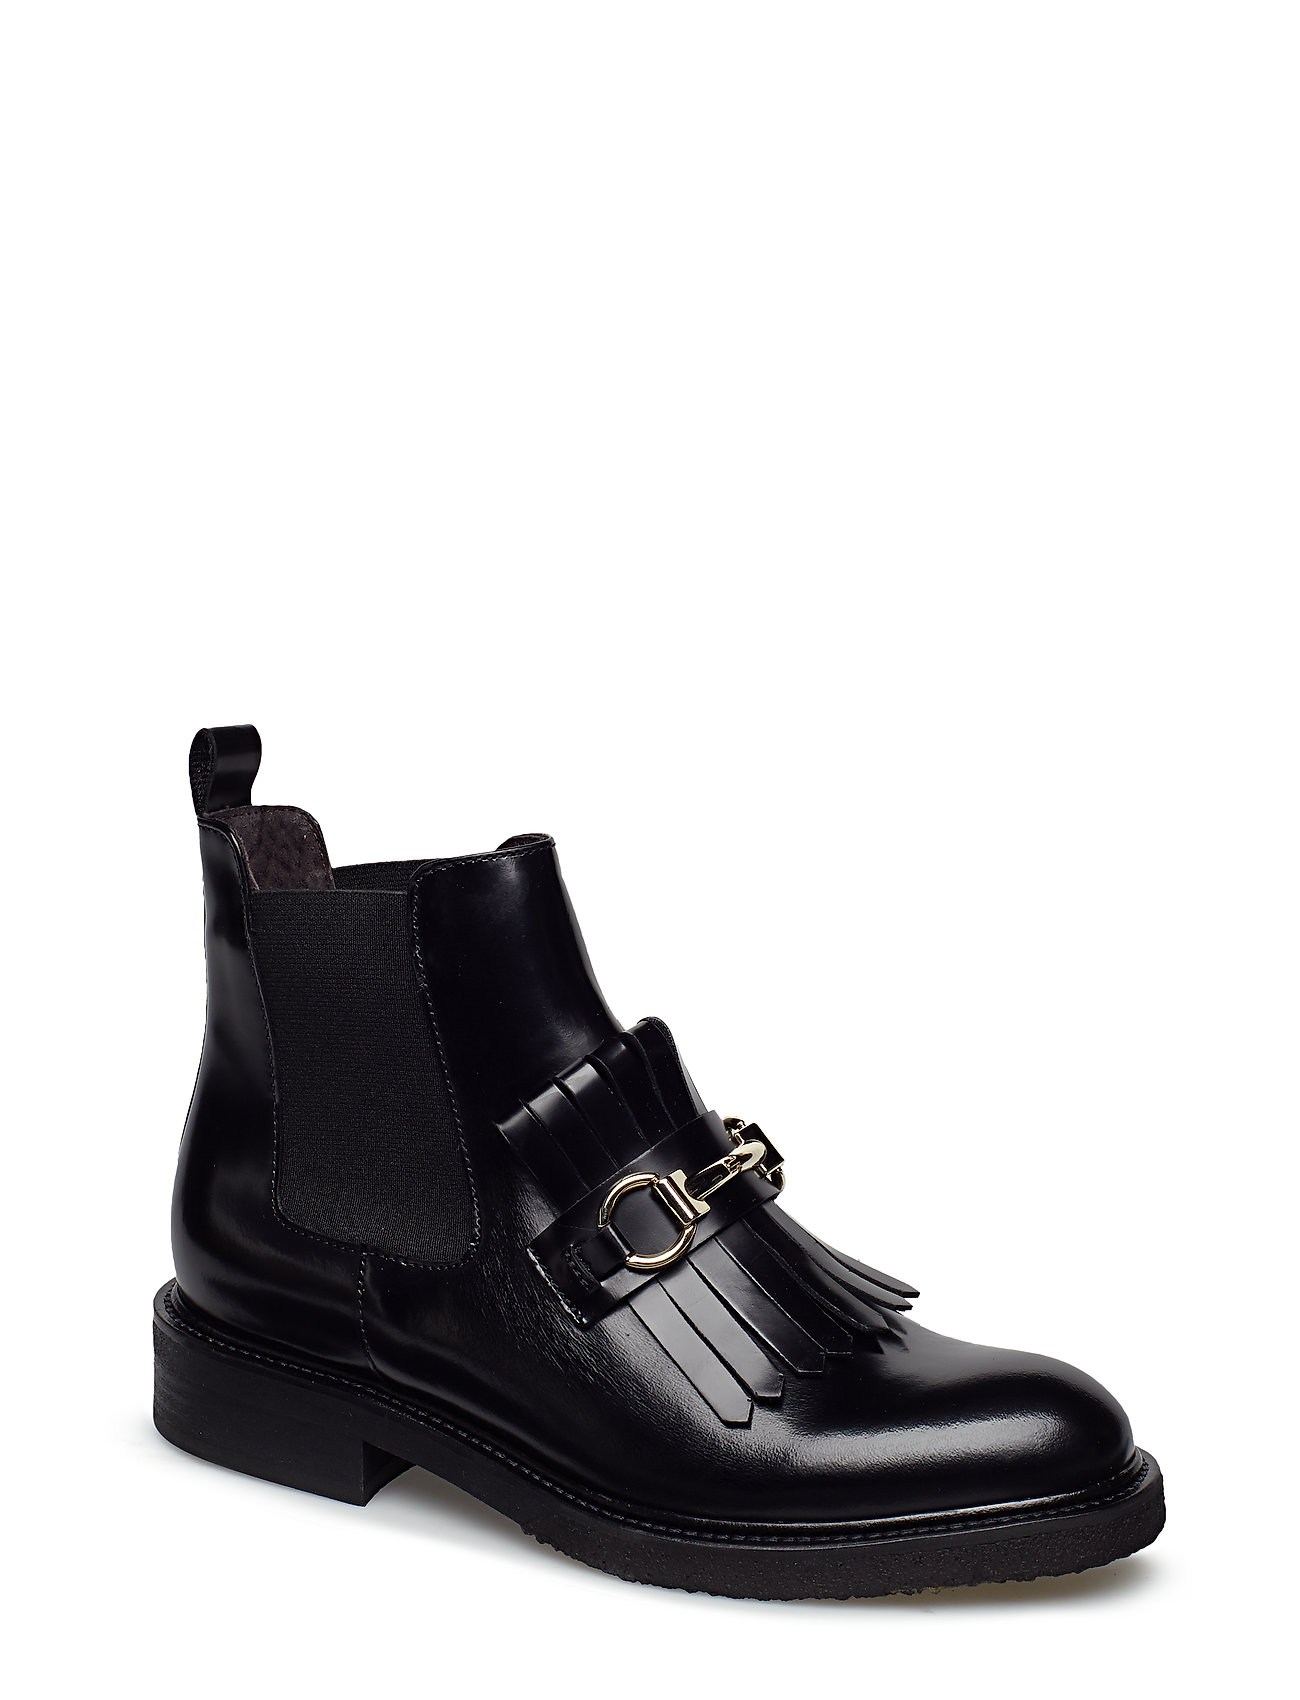 Boots 7426 Shoes Boots Ankle Boots Ankle Boots Flat Heel Sort Billi Bi